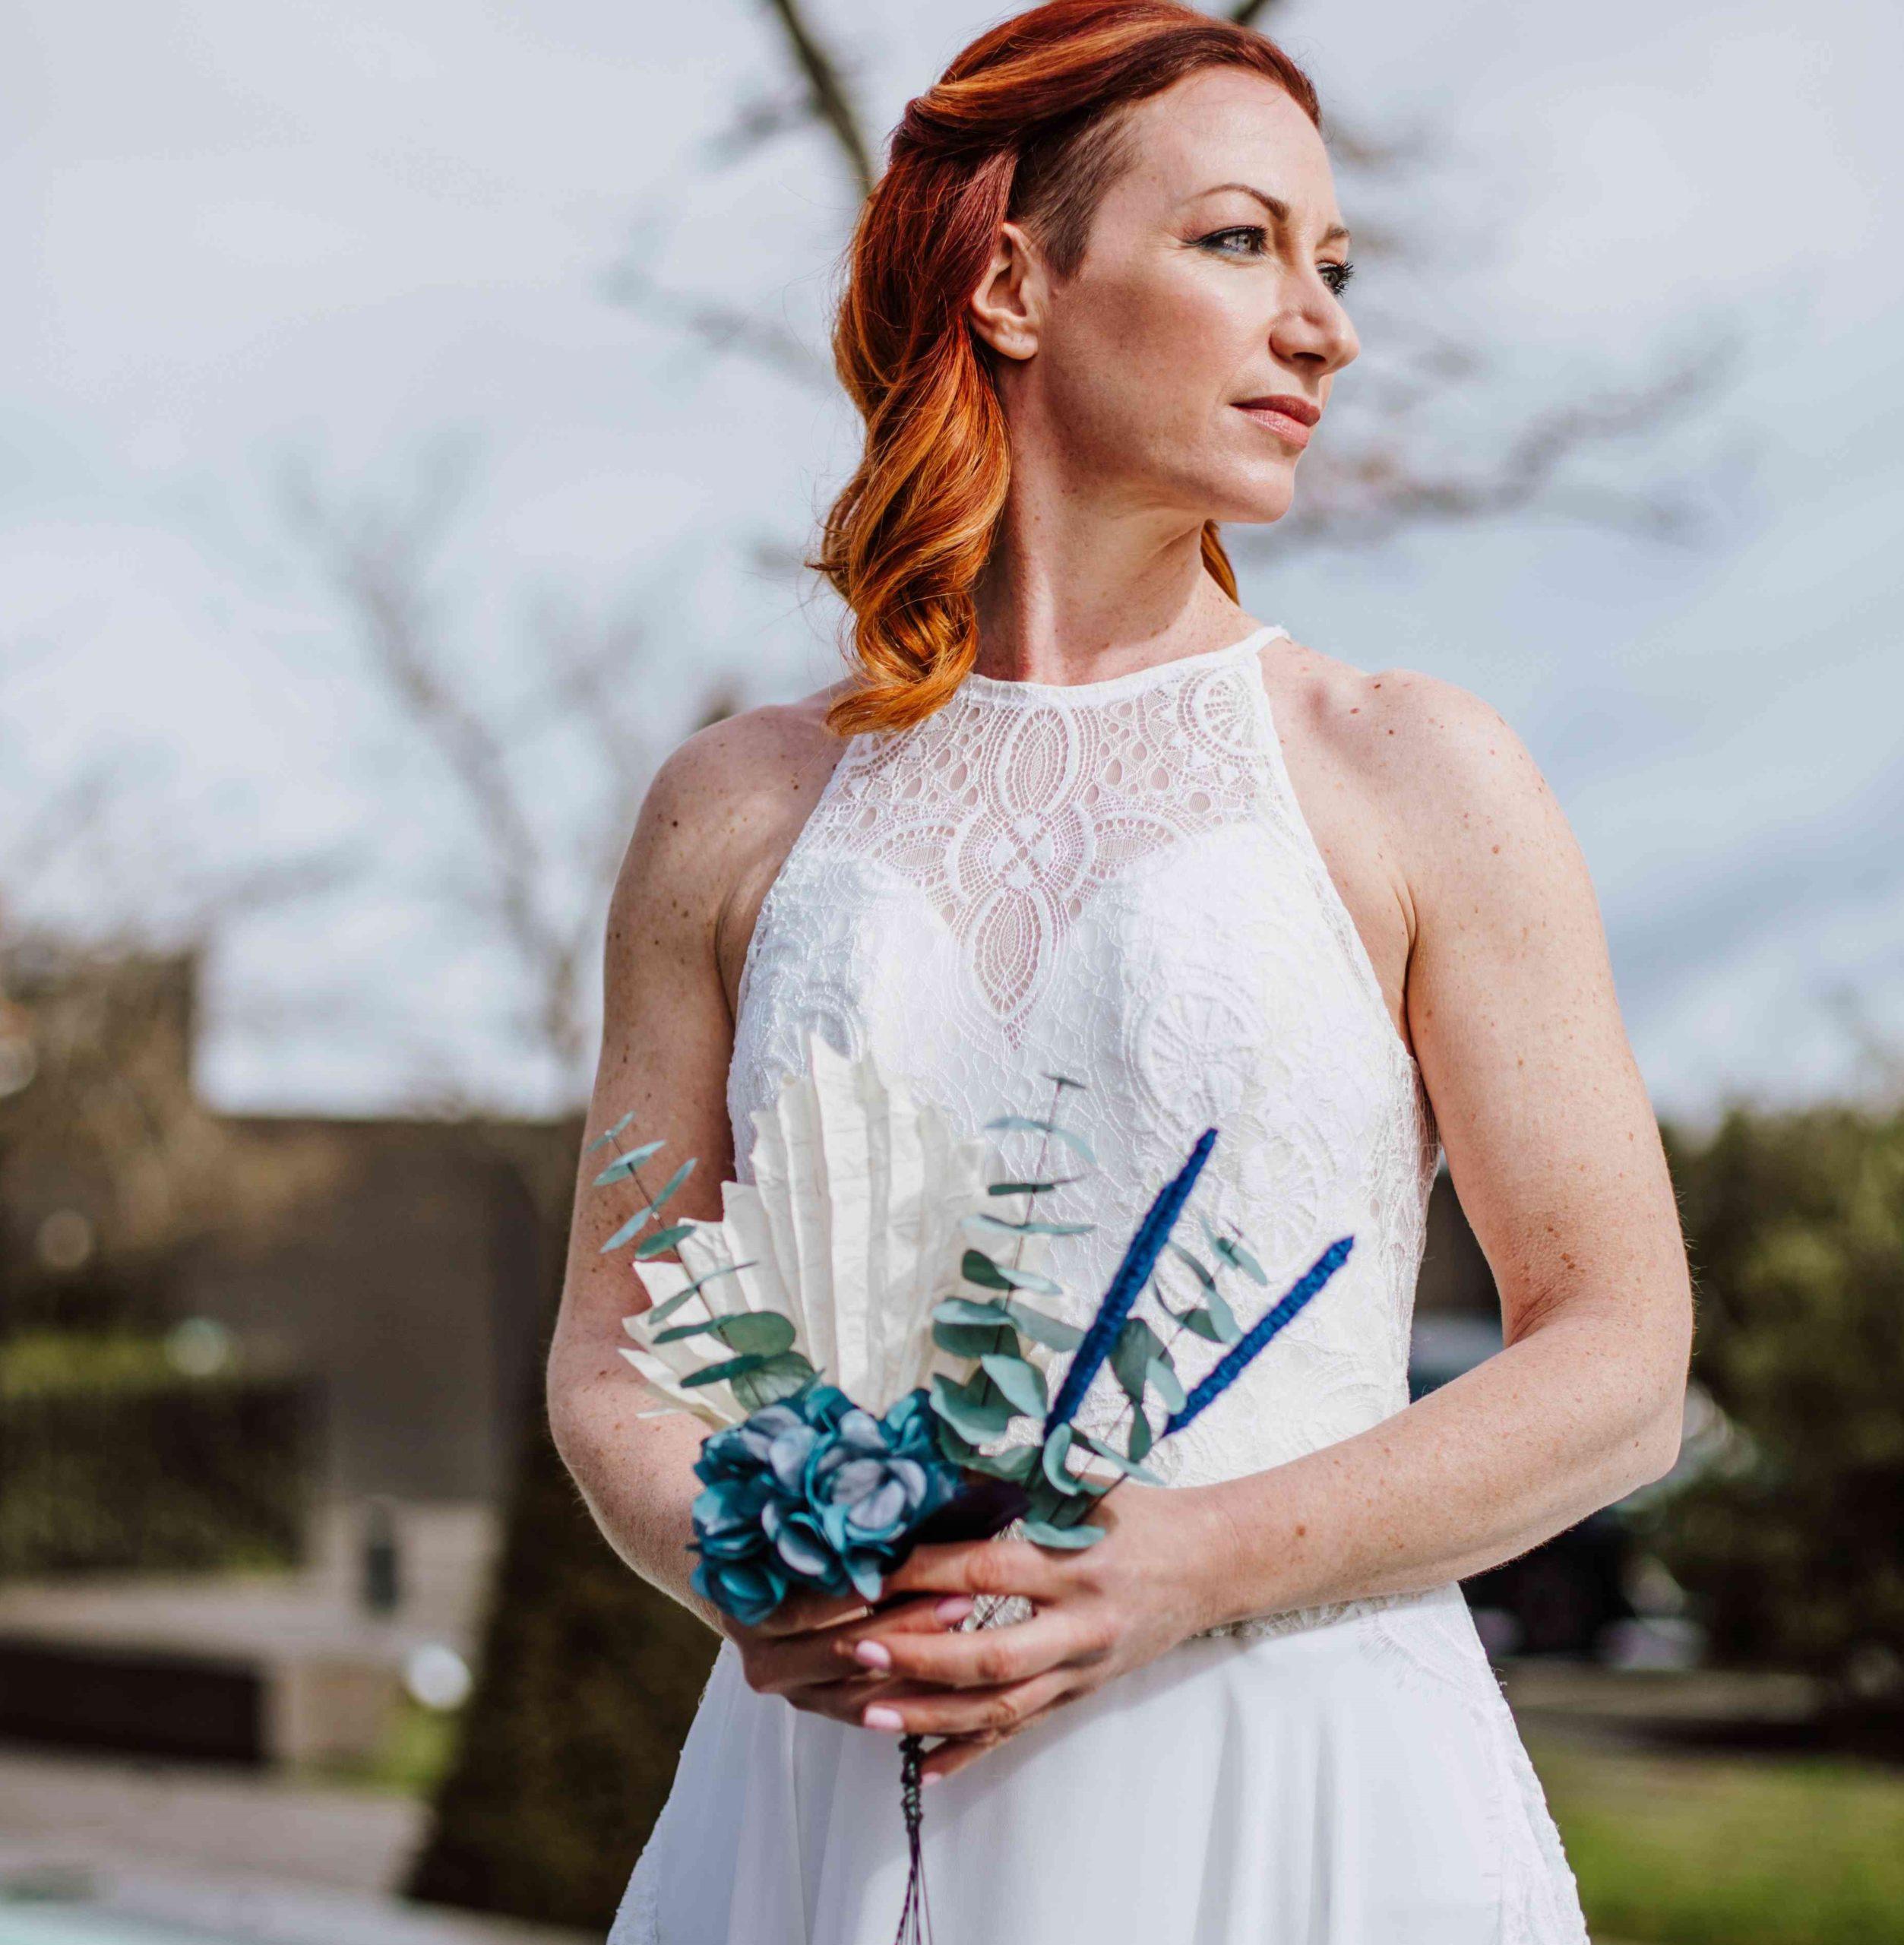 Bouquet sauvage 2 Alice Marty - Couture florale Accessoires Mariage